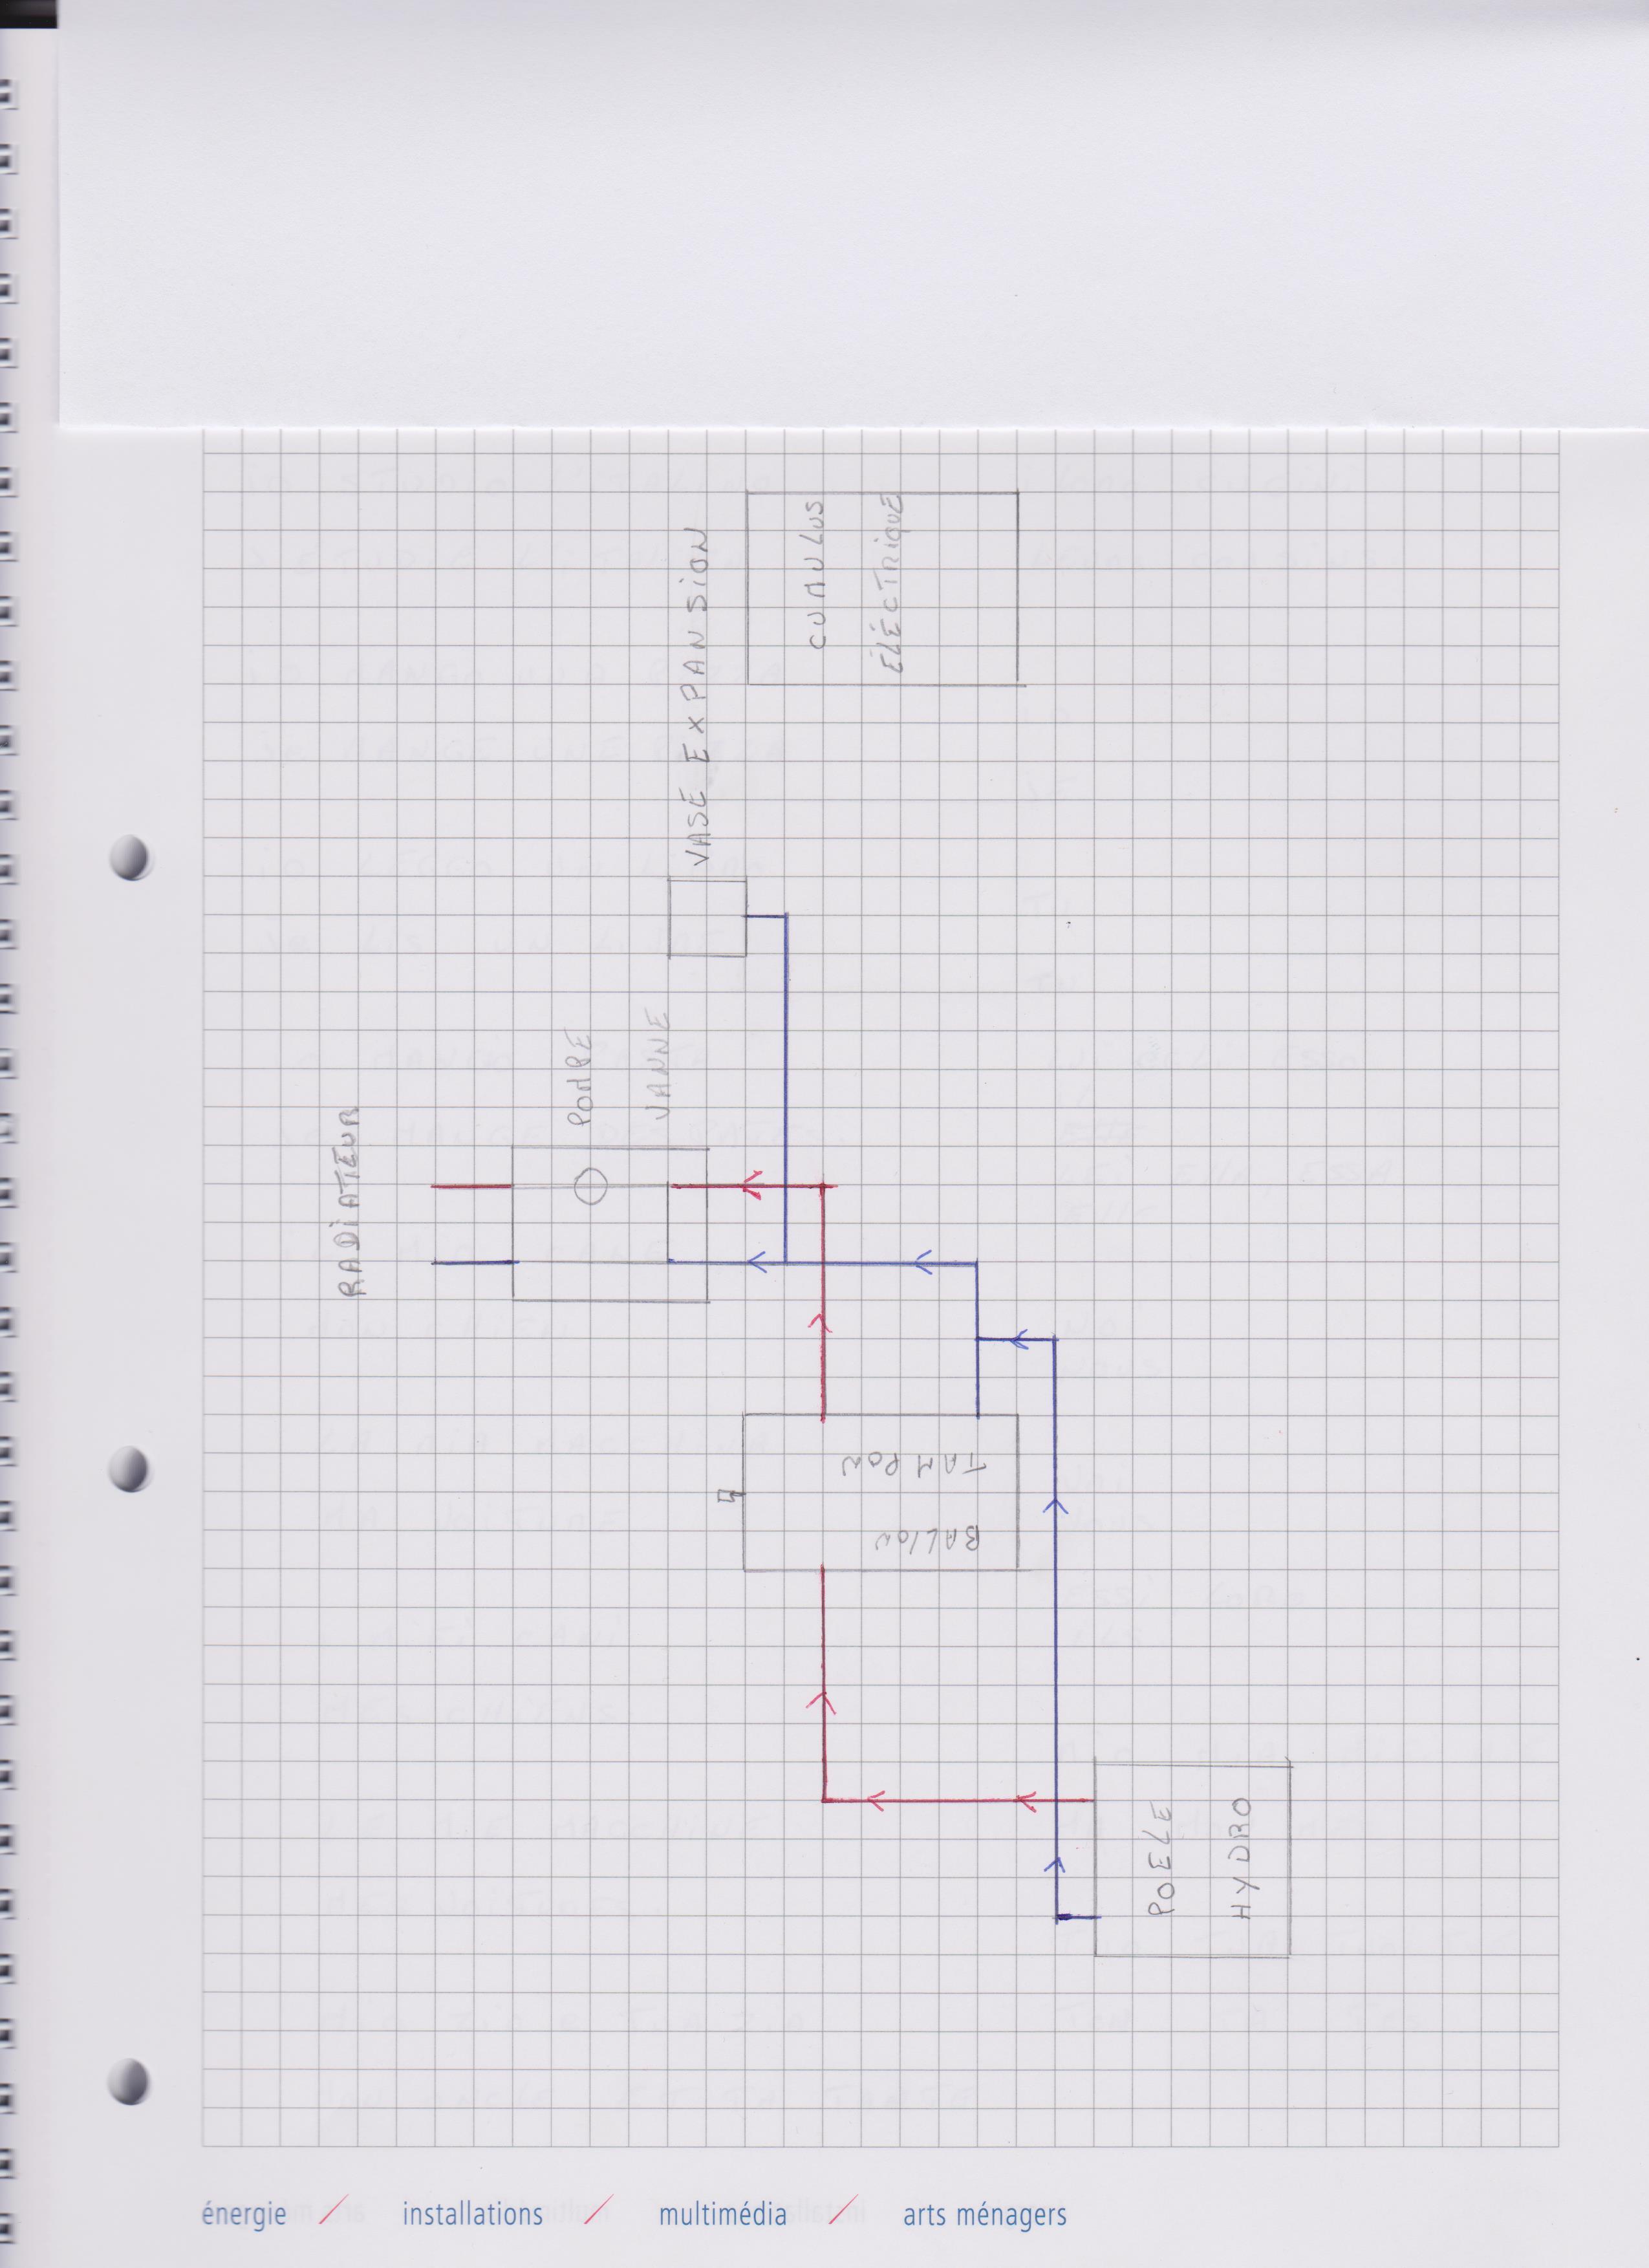 plan 001.jpg, 512.76 kb, 2550 x 3507